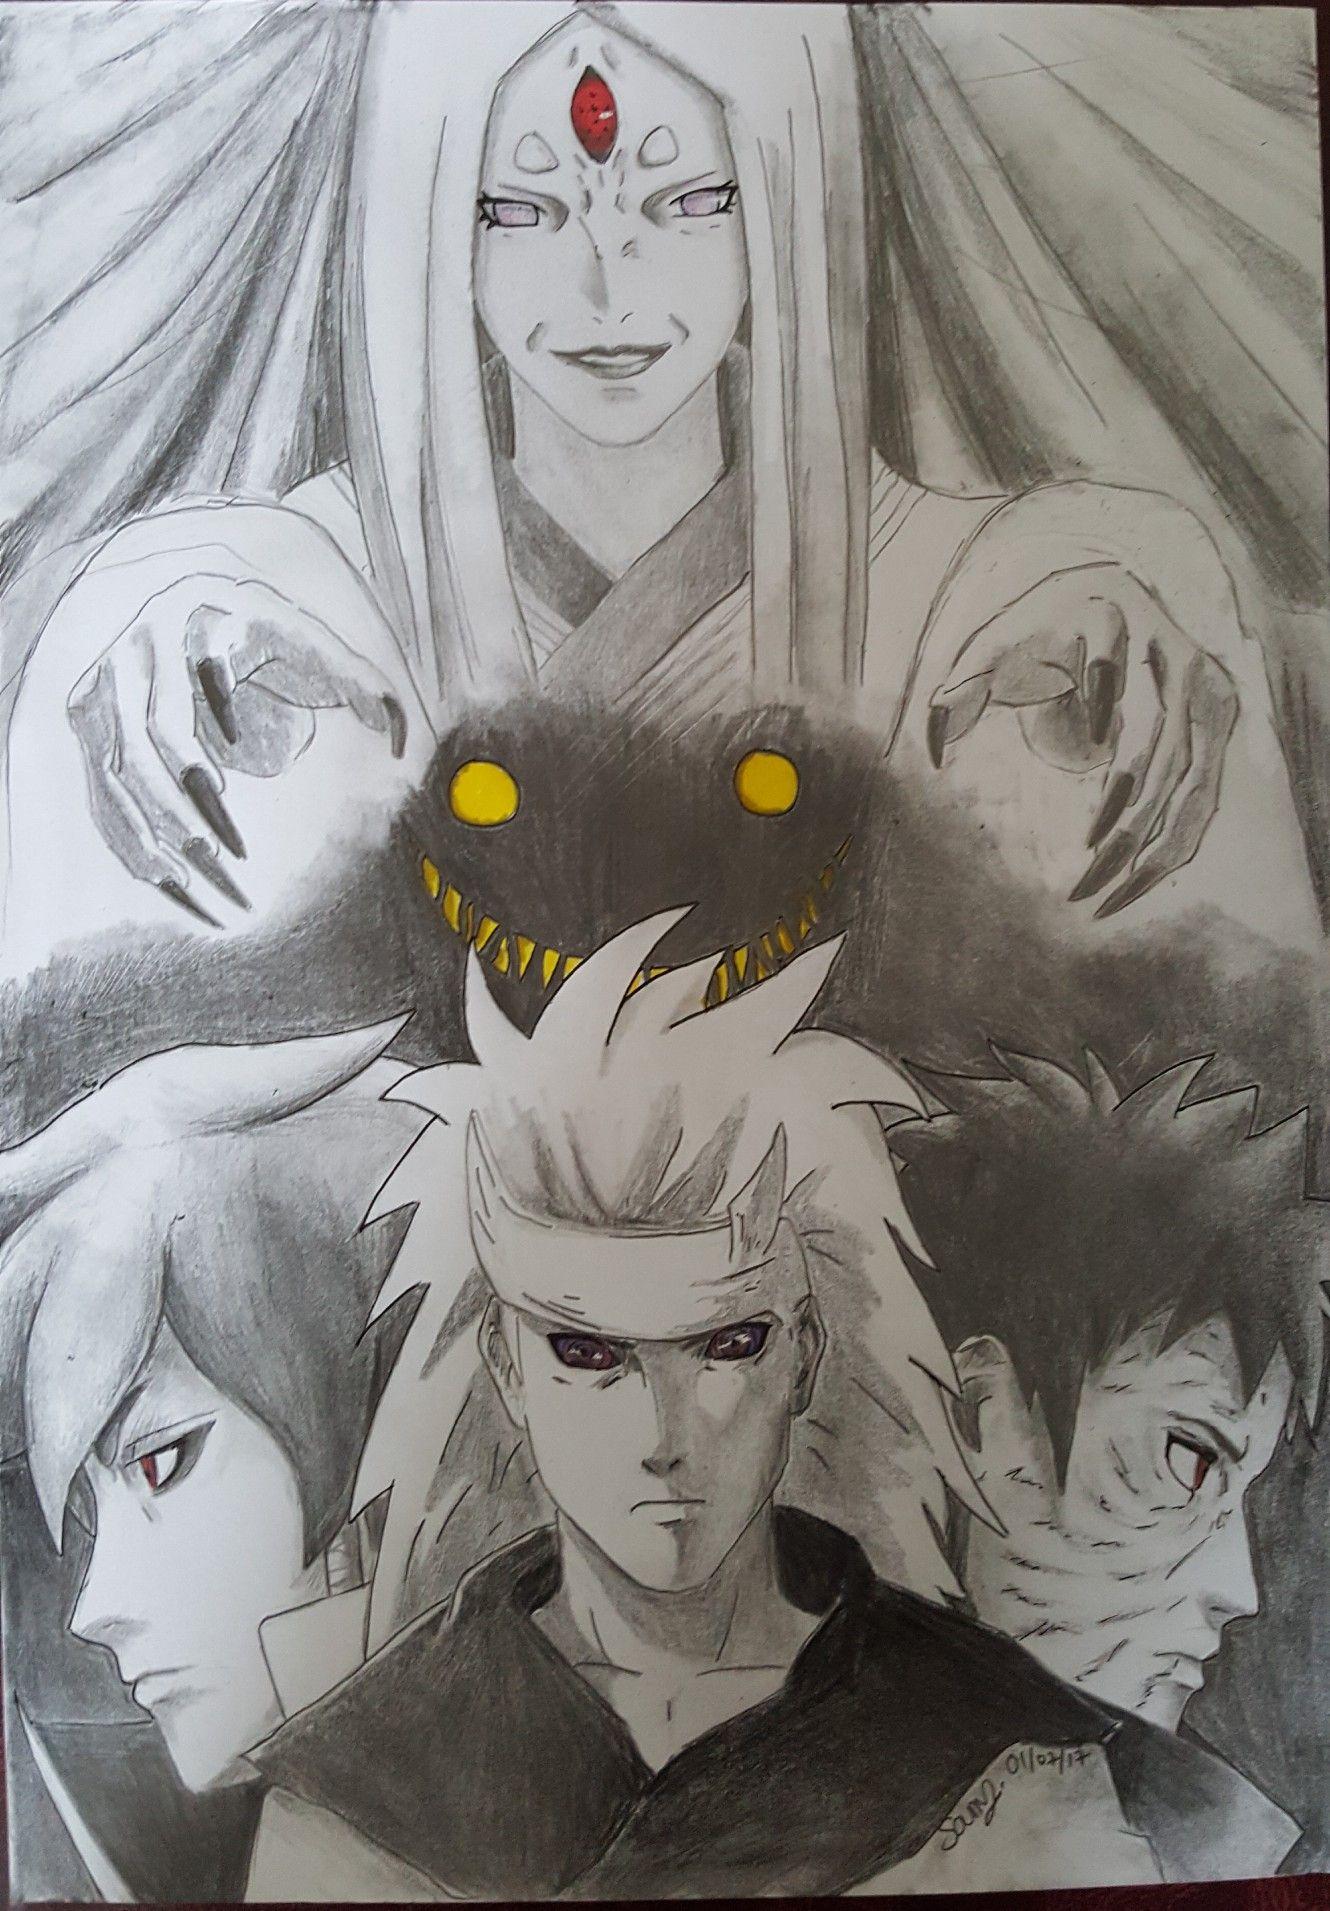 Ootsutsuki Kaguya Uchiha Obito Uchiha Madara Ootsutsuki Indra